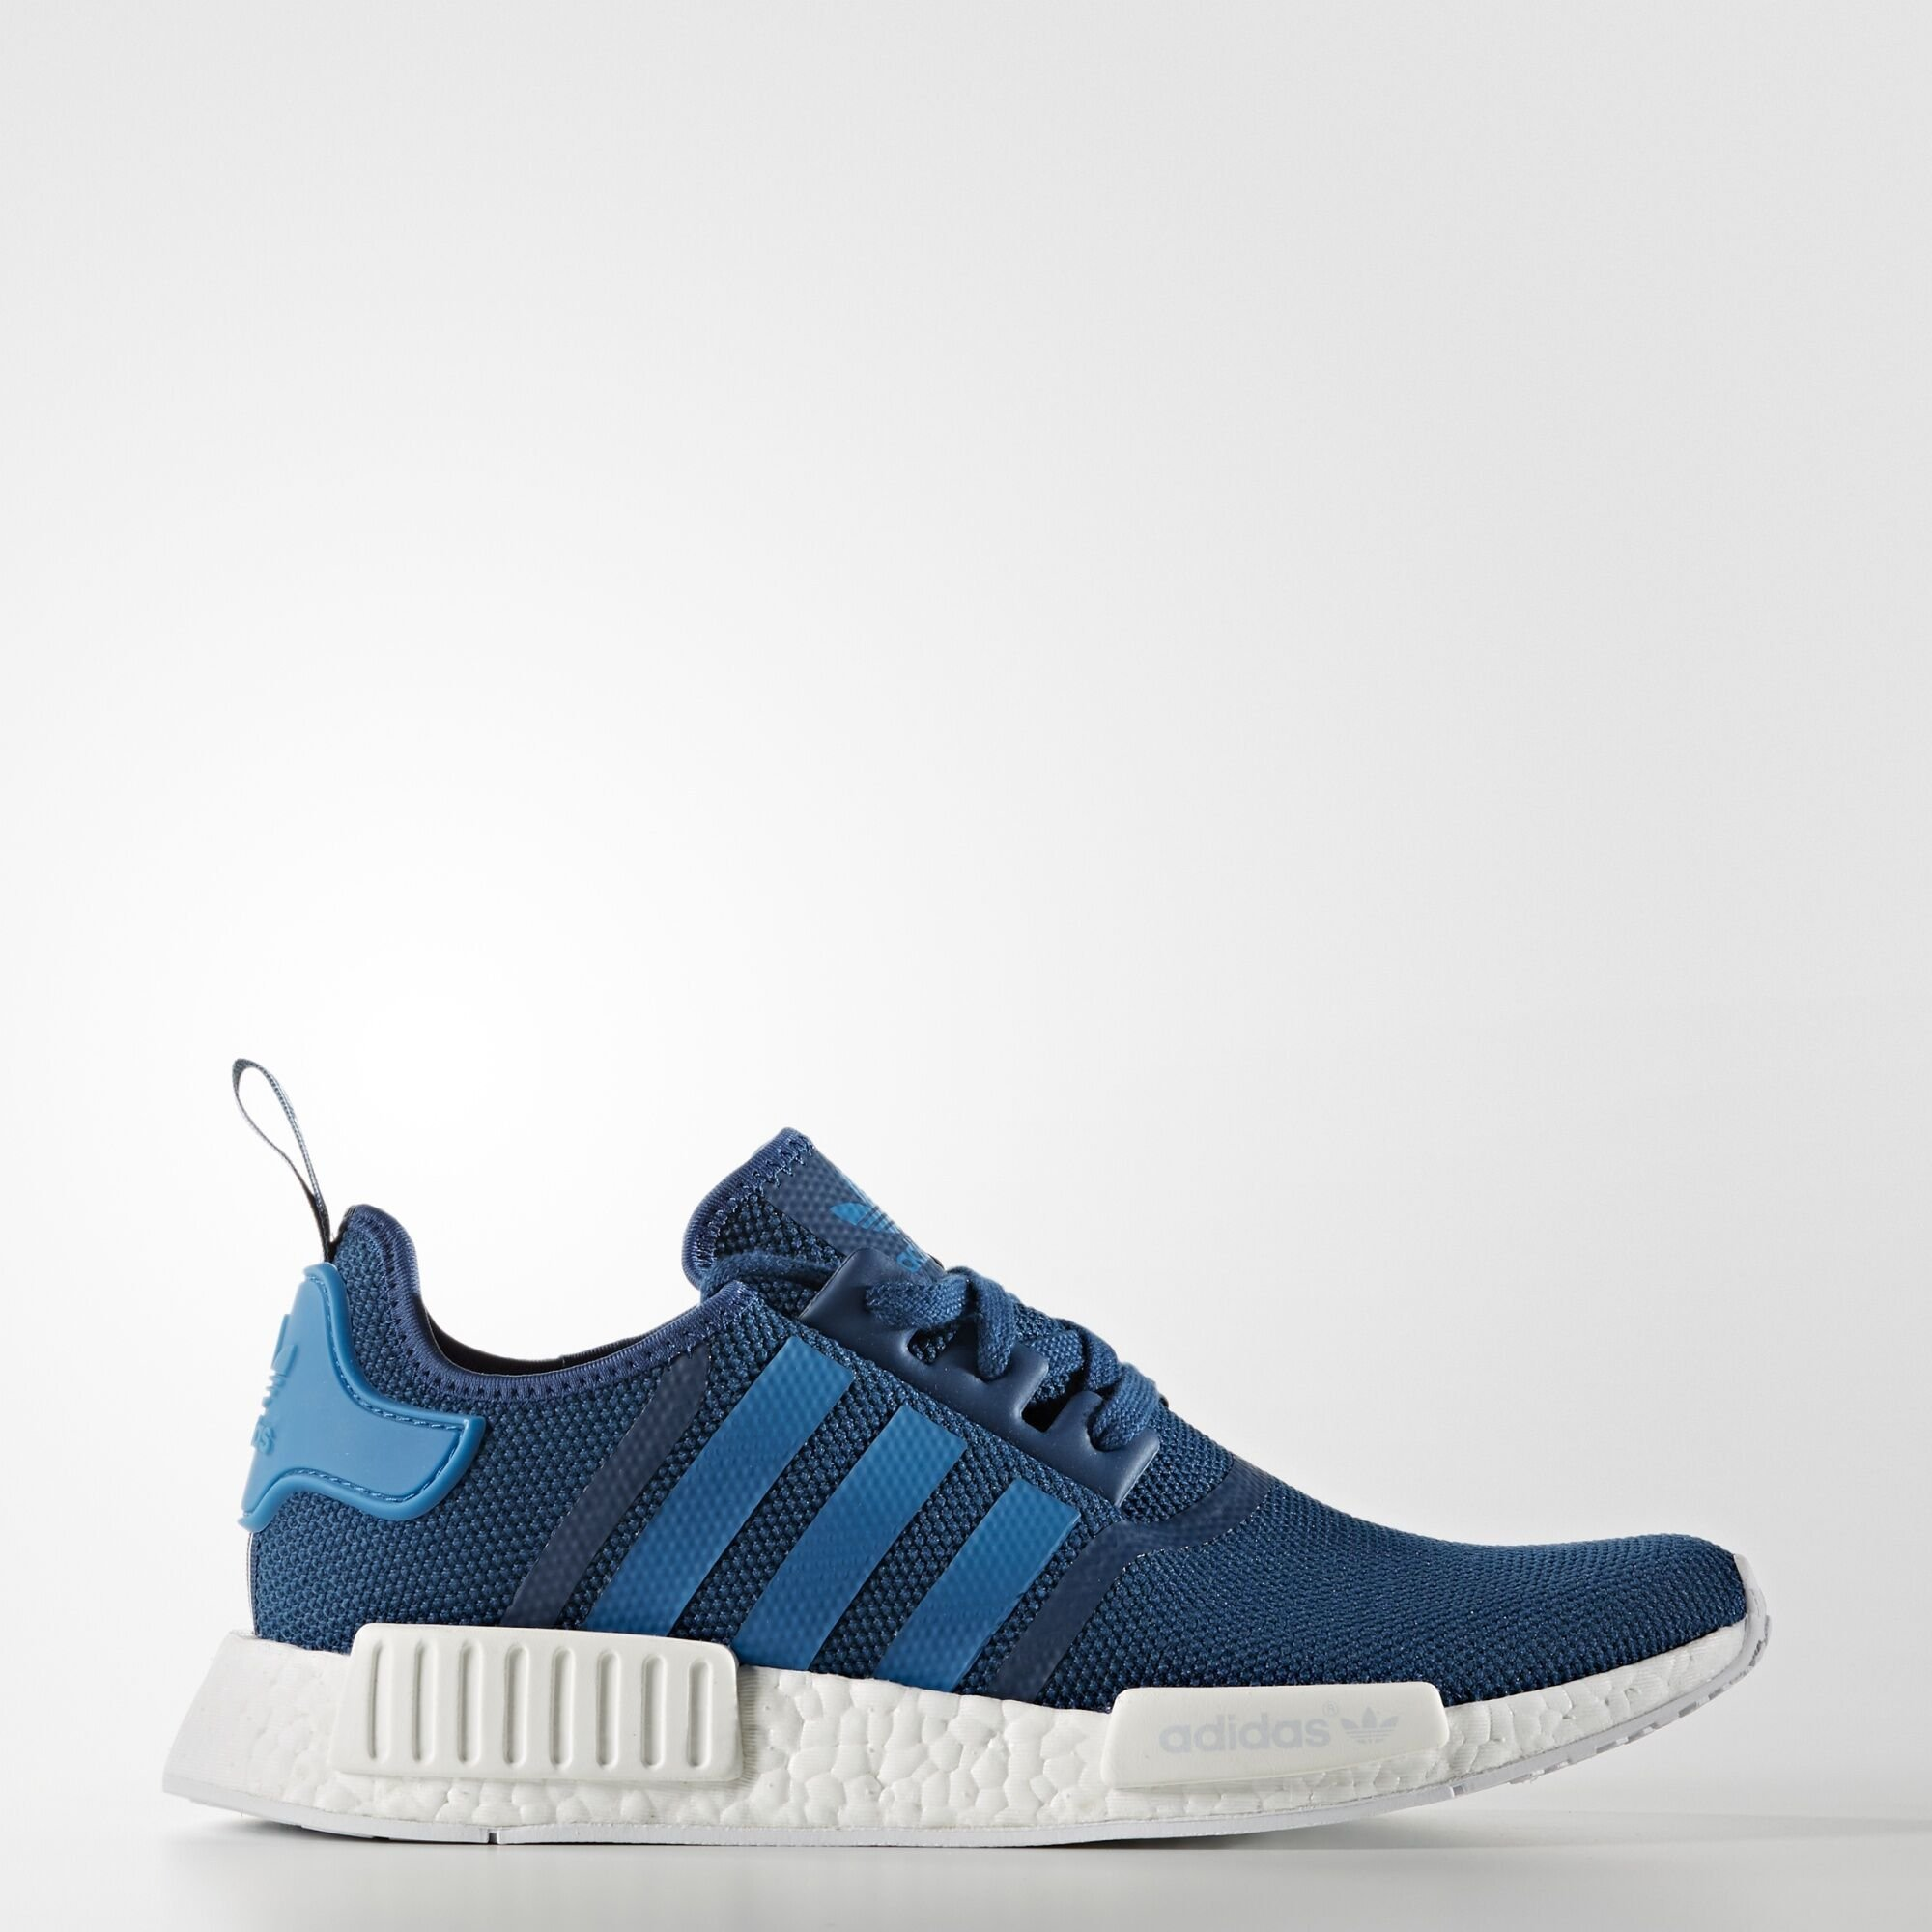 adidas  NMD R1 Blue White (S31502)